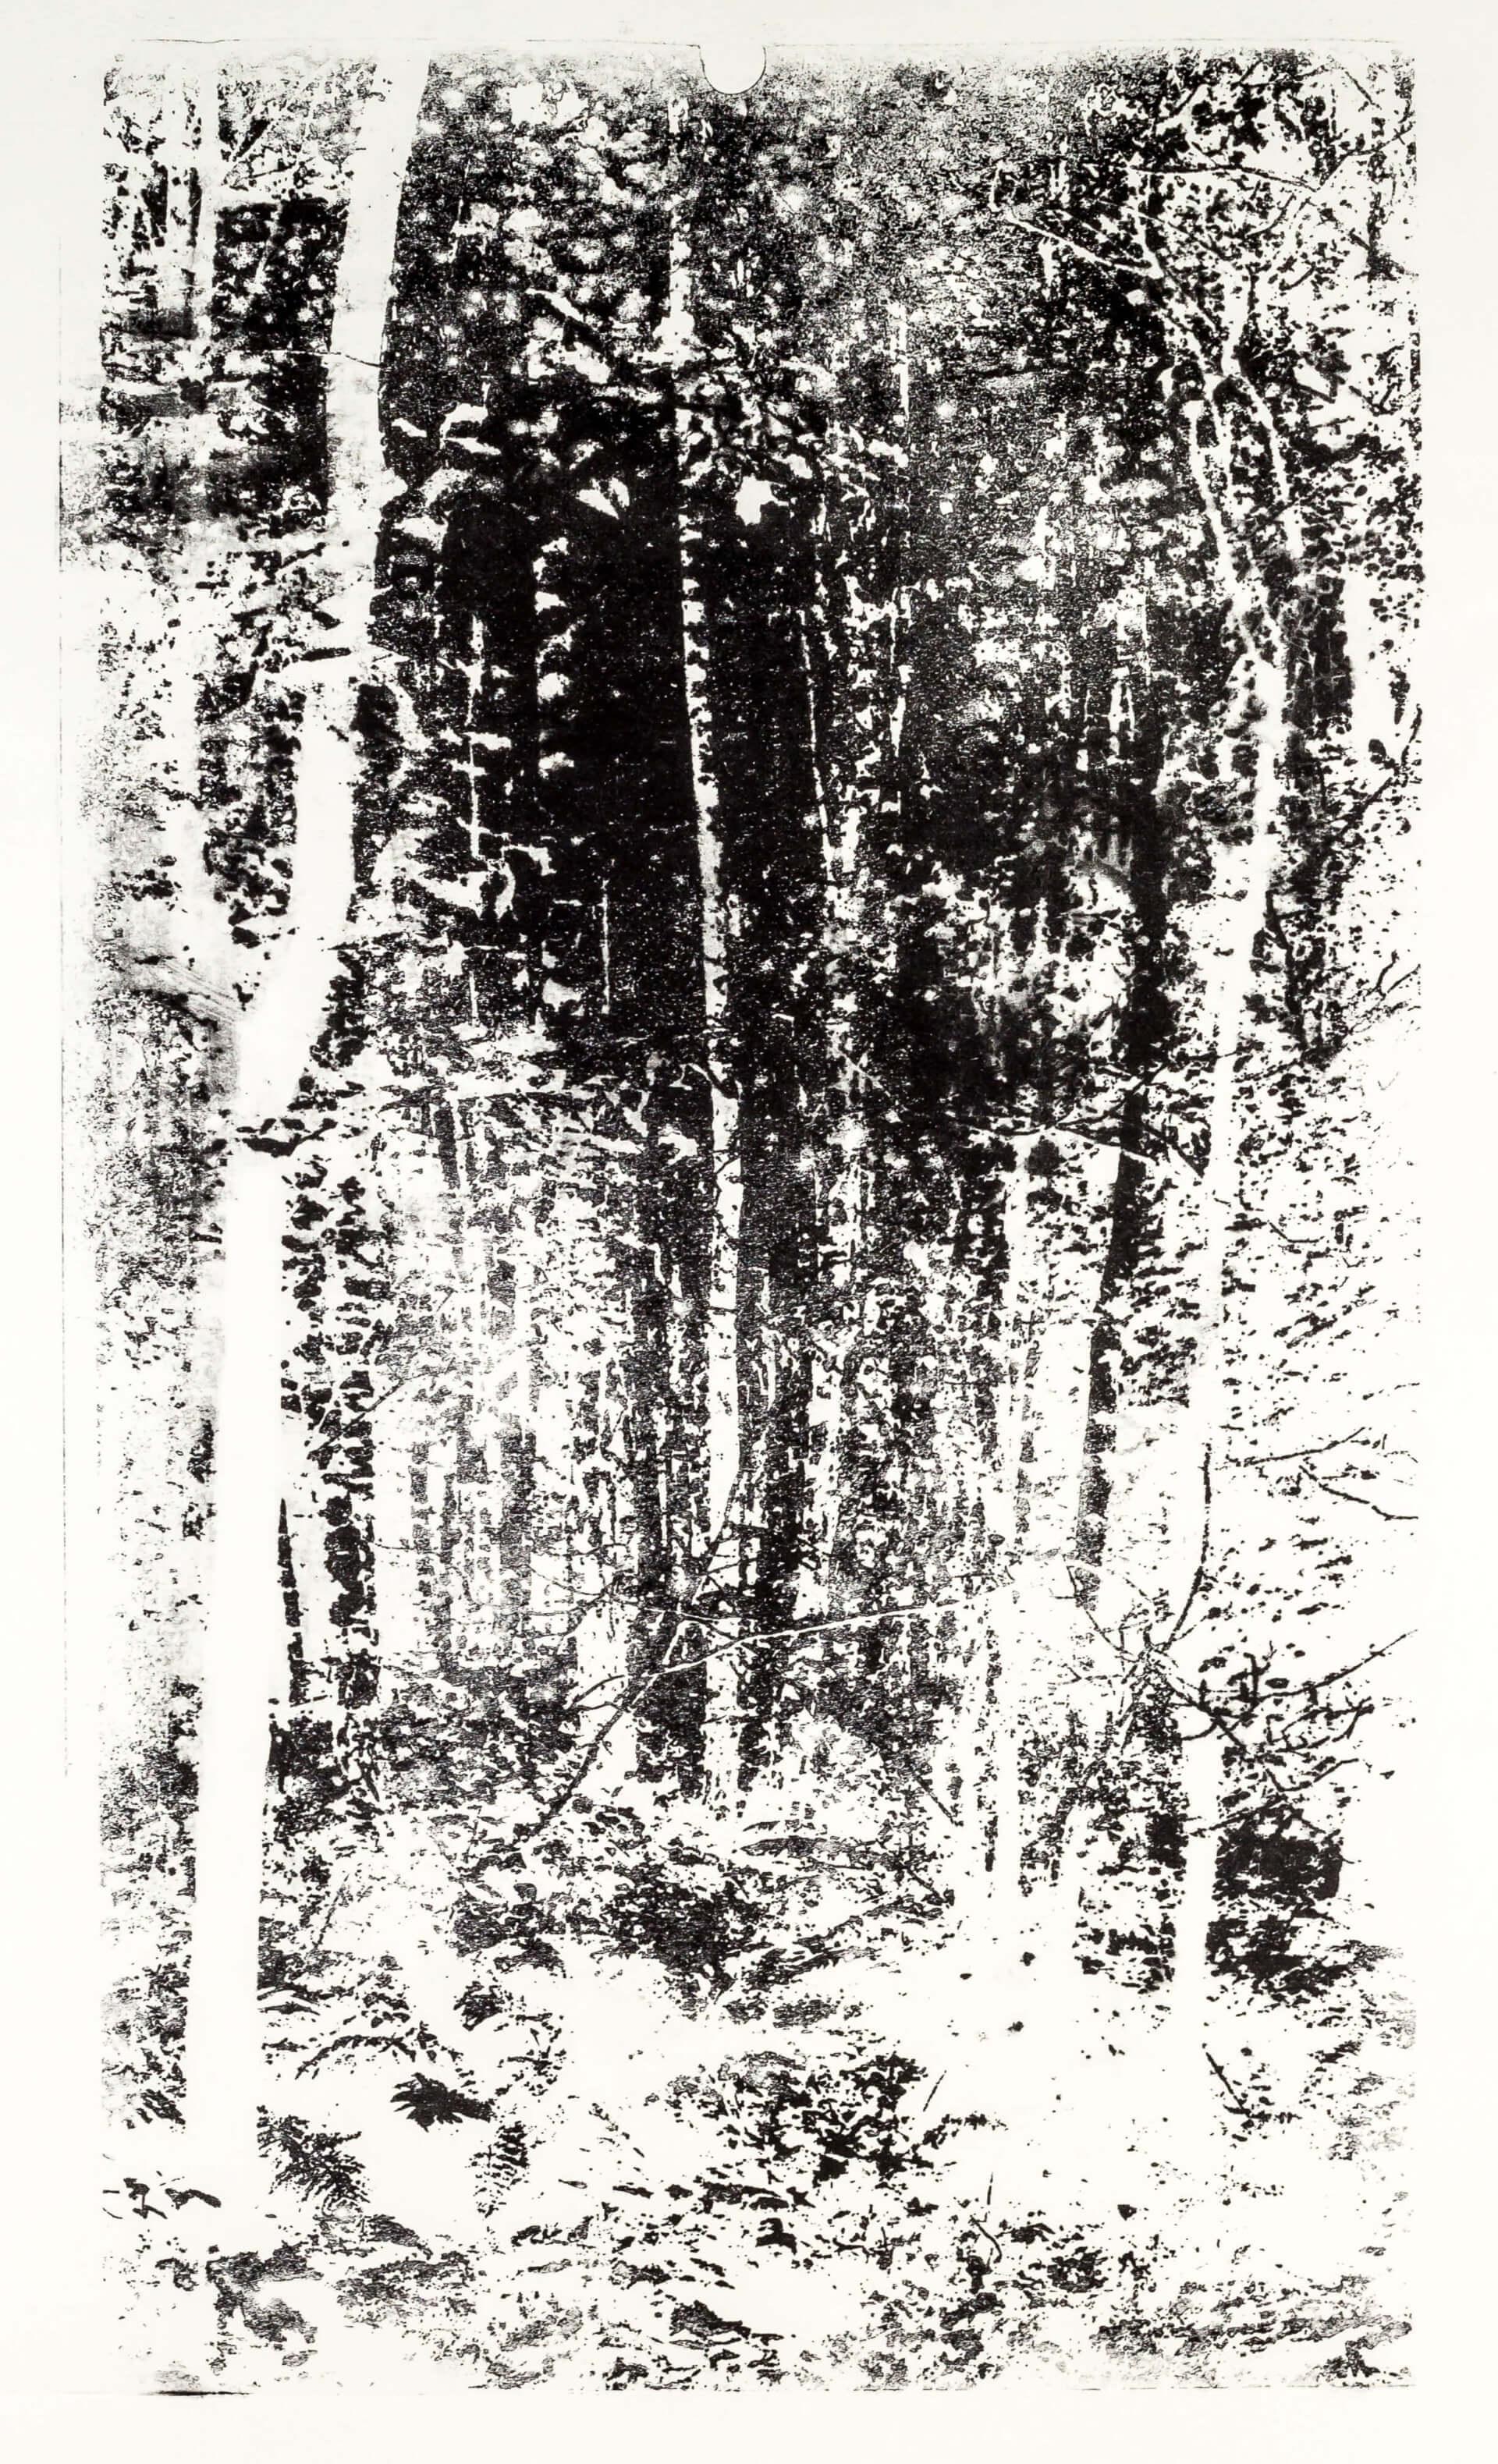 Katharina Albers, Wald XX-III, 2015, Lithographie, Unikat, 60×33 cm